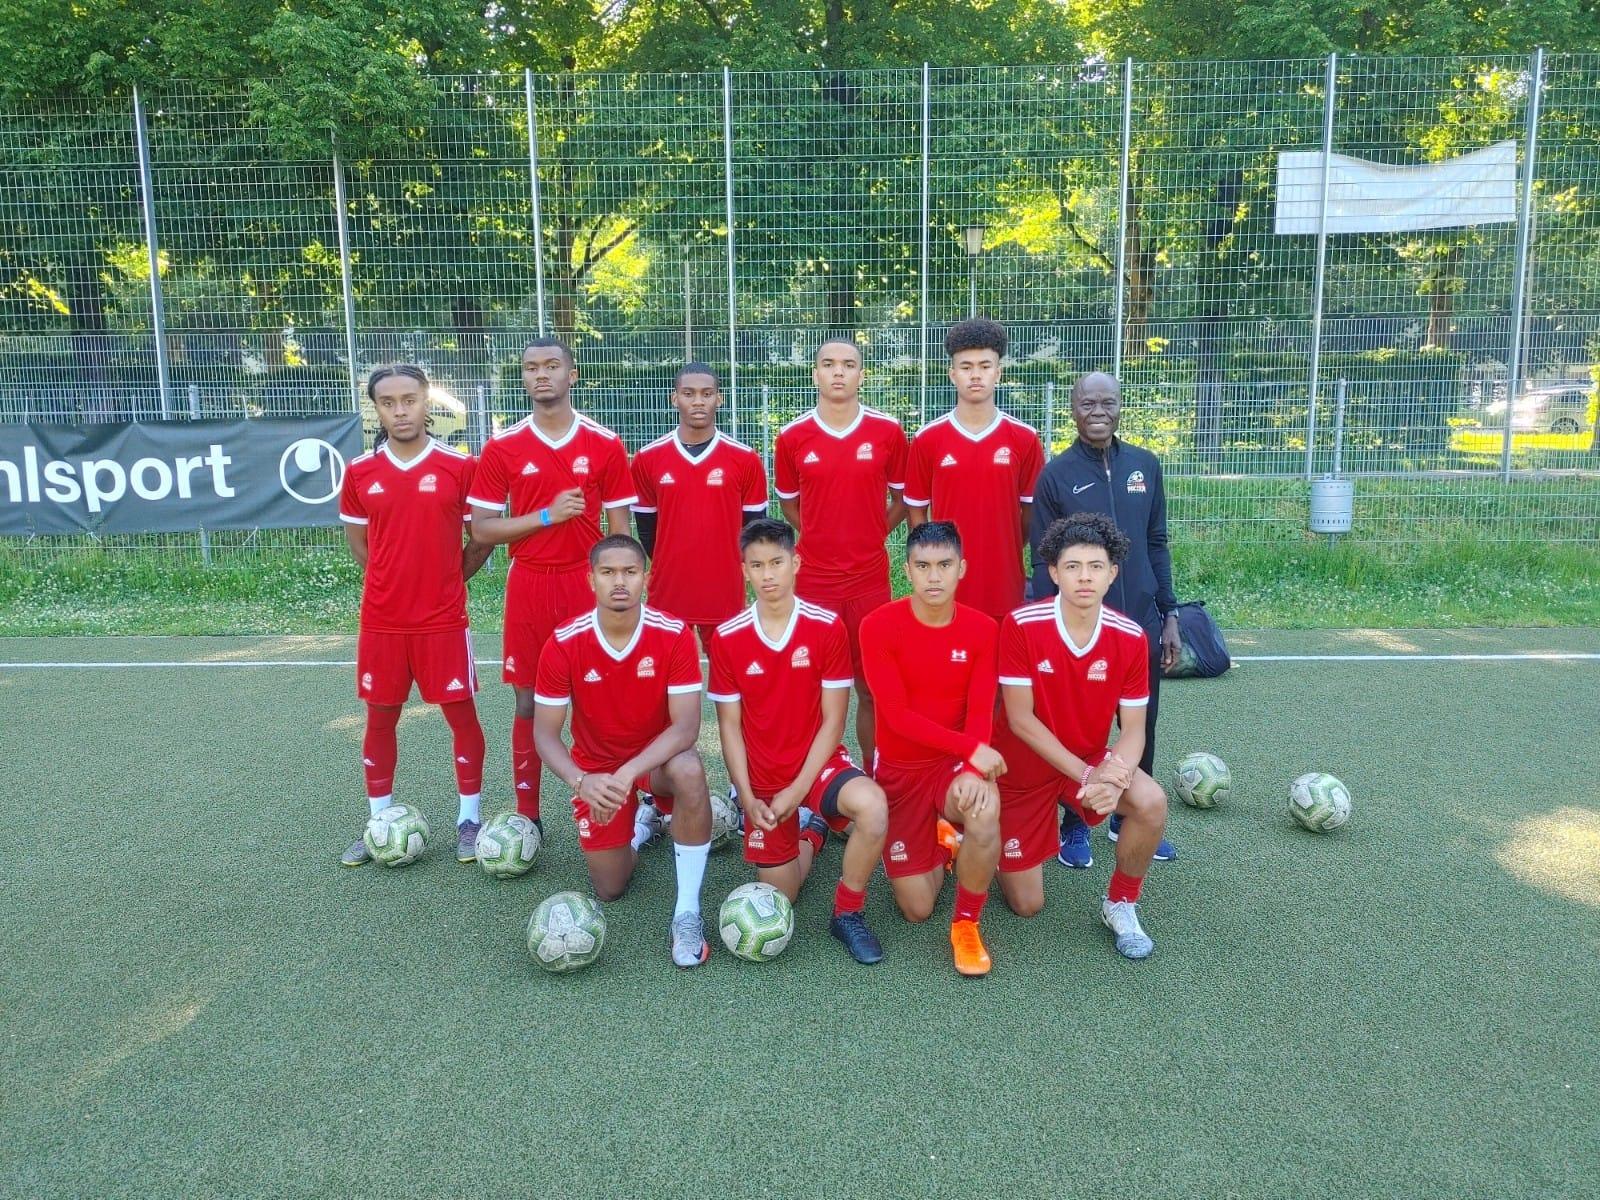 Munich Football School in Munich - 1